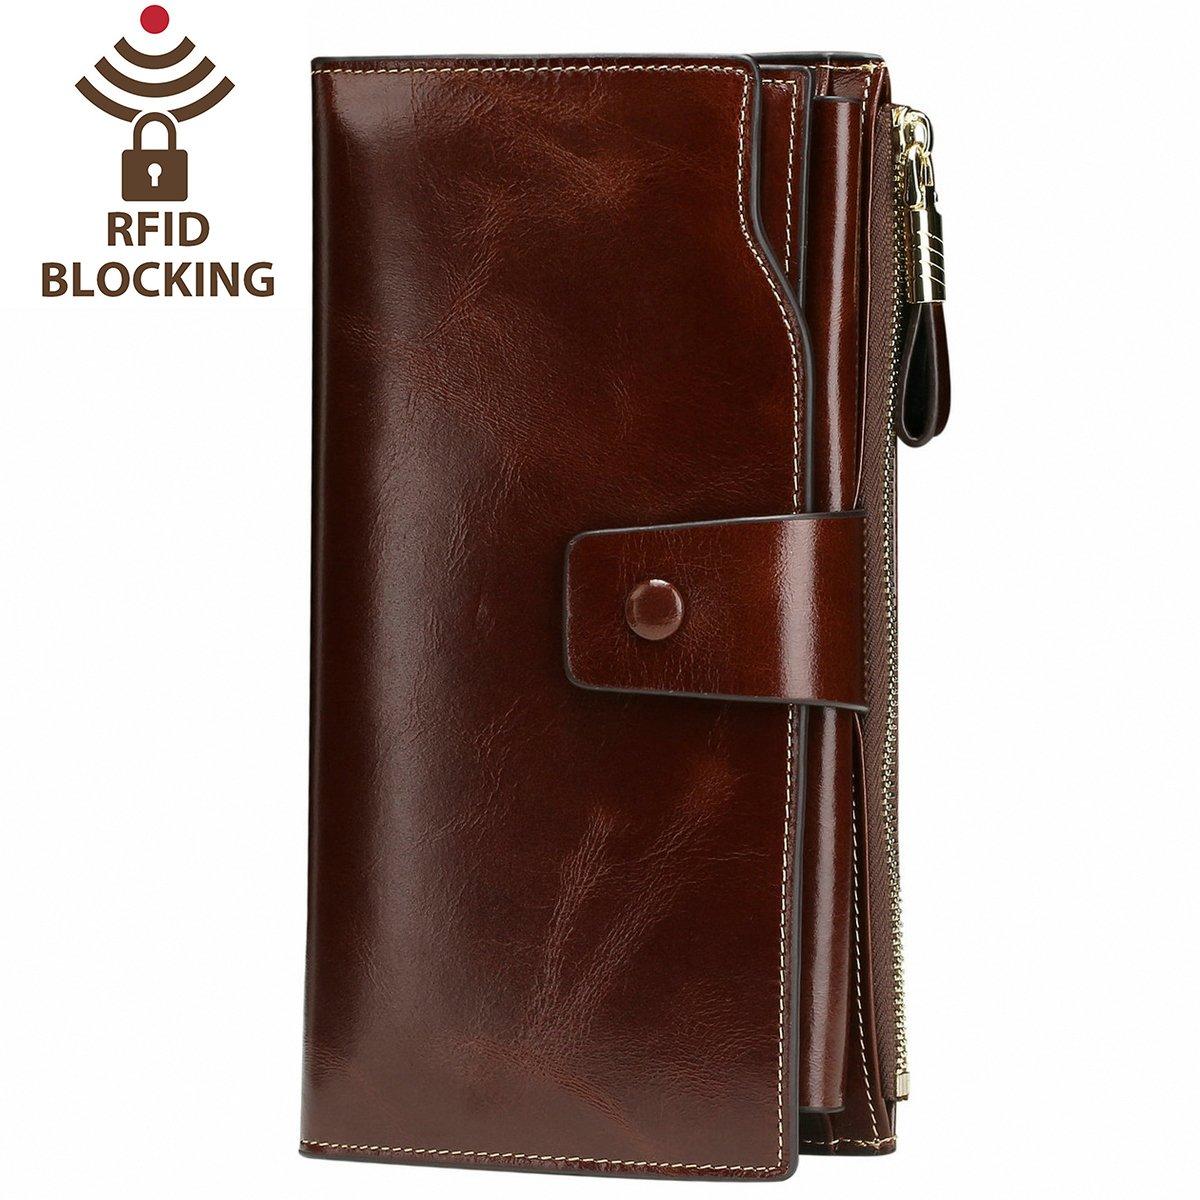 Itslife Women's RFID Blocking Large Capacity Luxury Wax Genuine Leather Cluth Wallet Ladies Card holder (Coffee RFID Blocking) by ITSLIFE